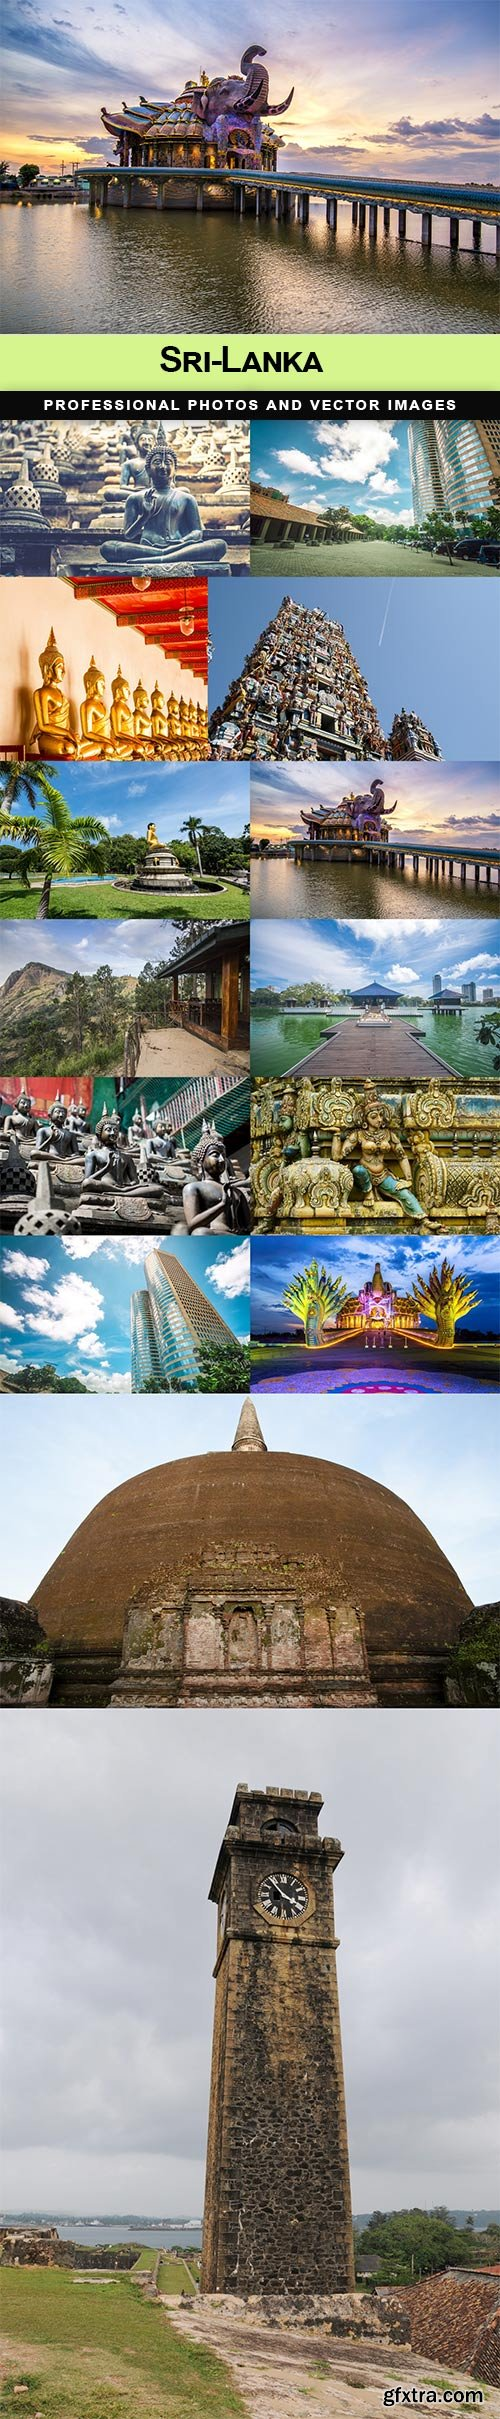 Sri-Lanka - 14 UHQ JPEG